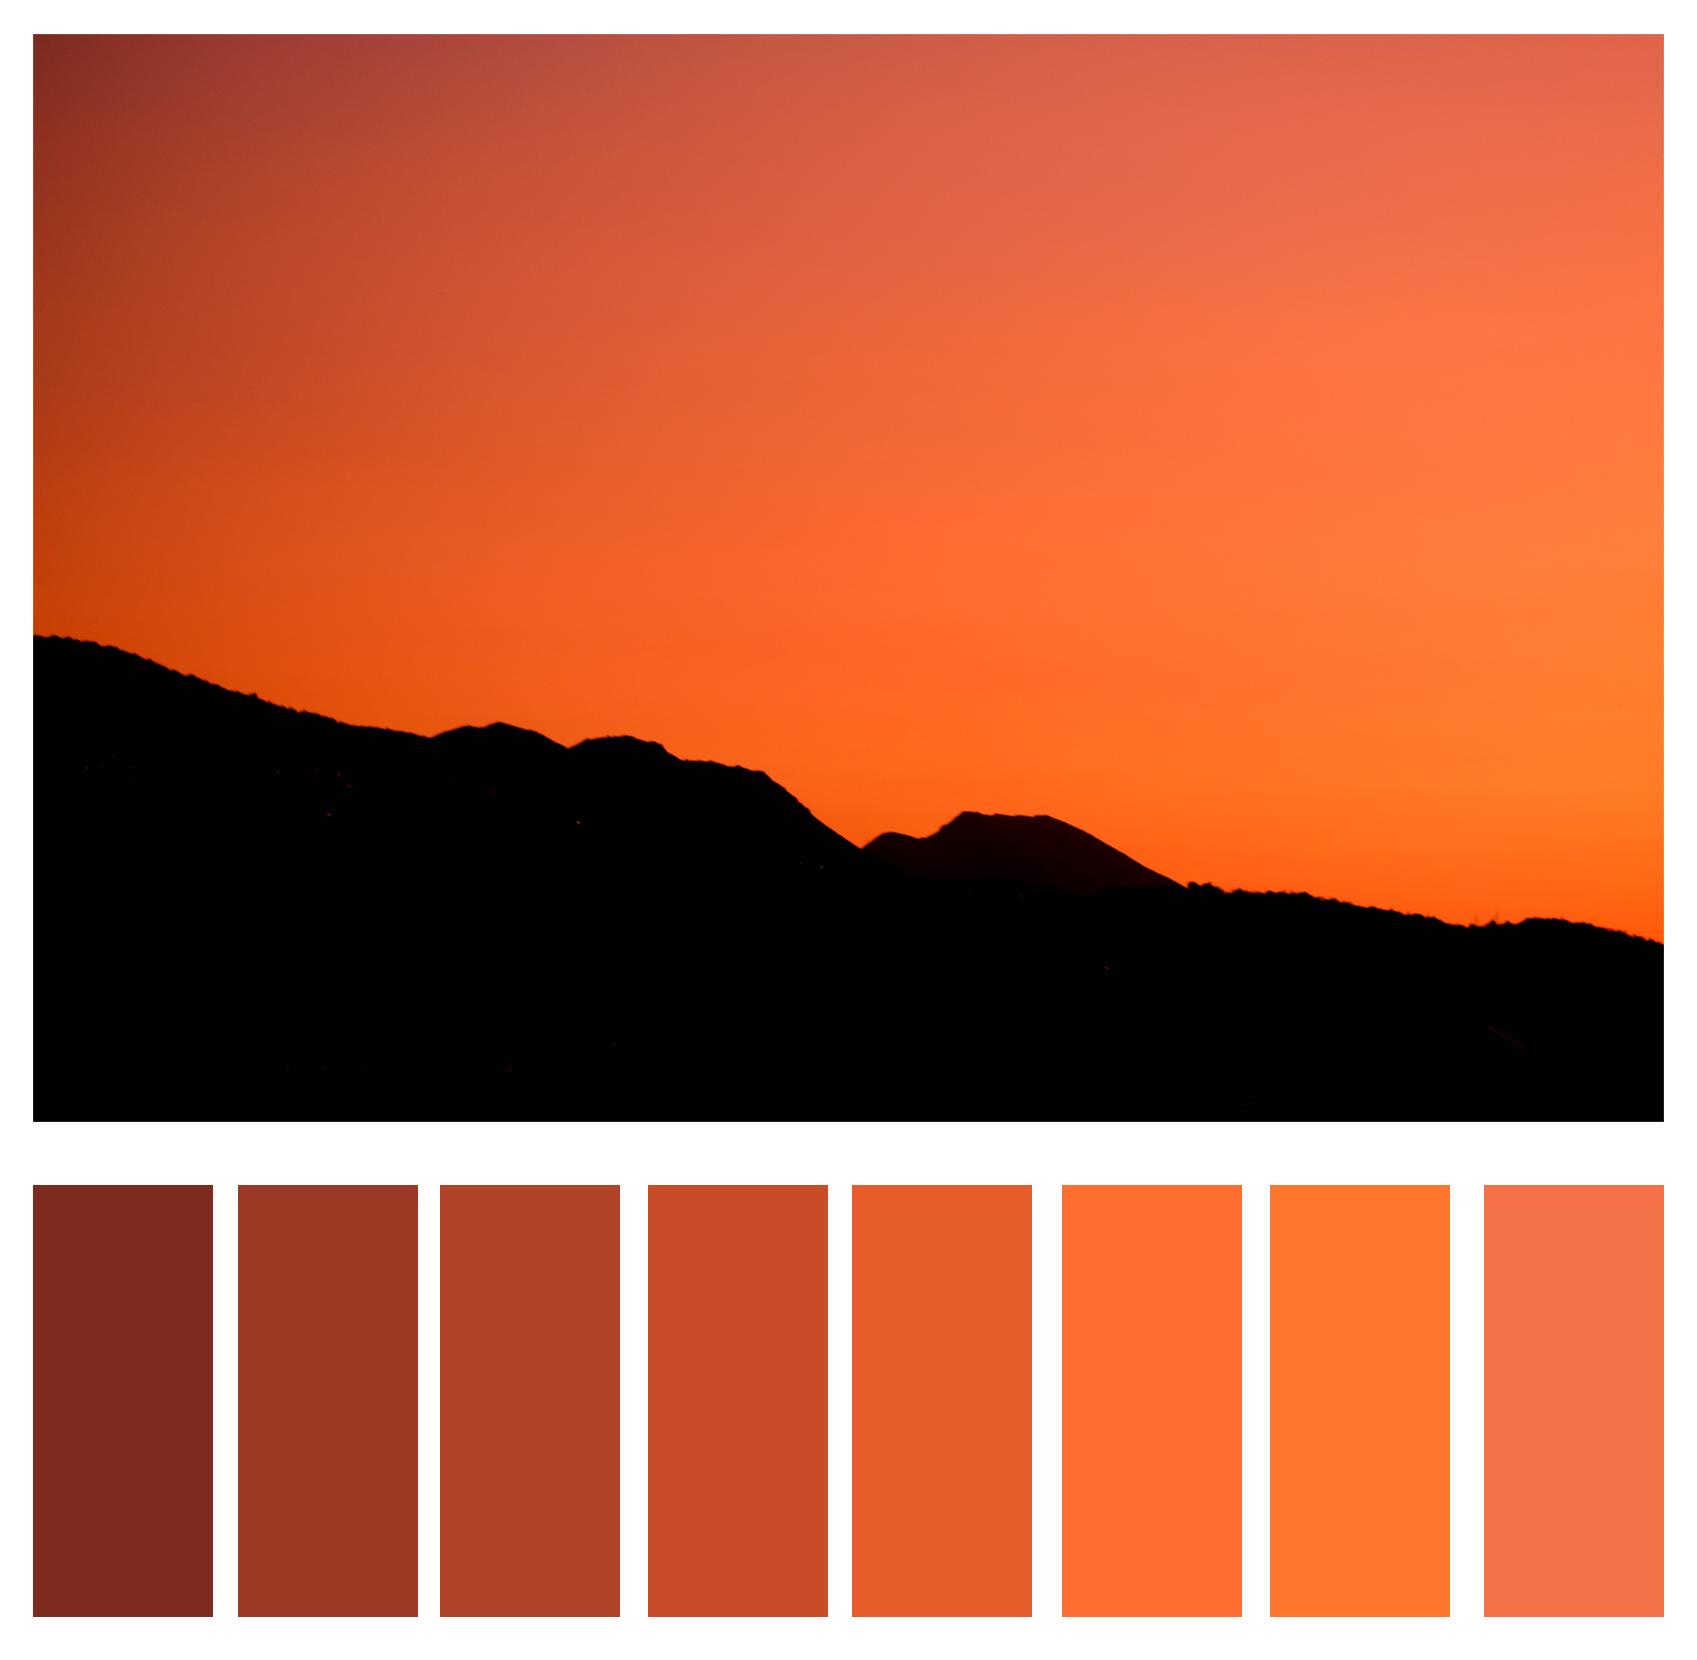 Figure 5b: Shades of orange.